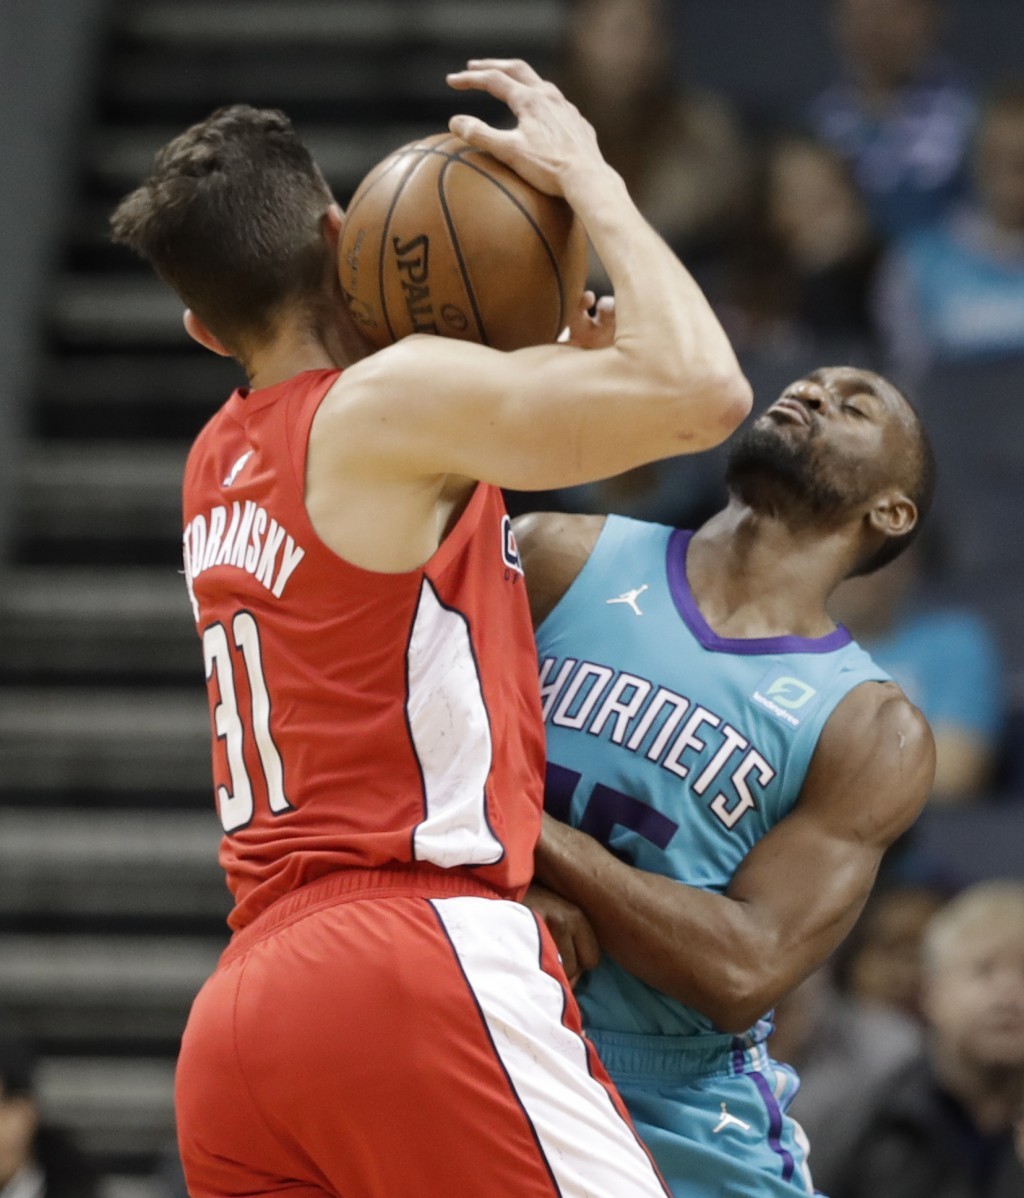 Washington Wizards guard Tomas Satoransky (31) runs into Charlotte Hornets guard Kemba Walker (15) during the first half of an NBA basketball game in ...